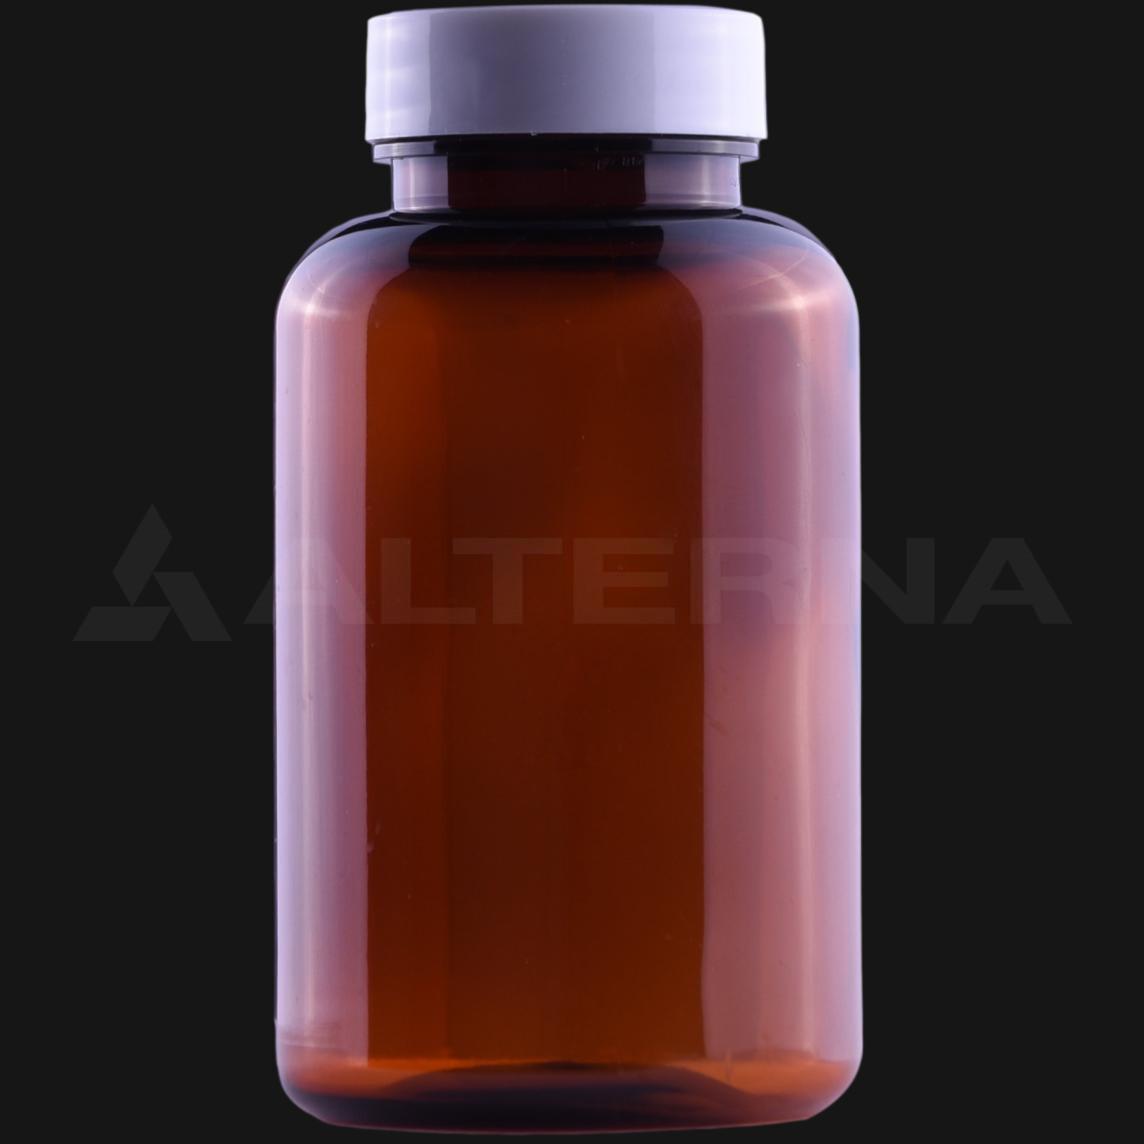 200 ml PET Pill Bottle with 38 mm Alu. Foil Seal Cap